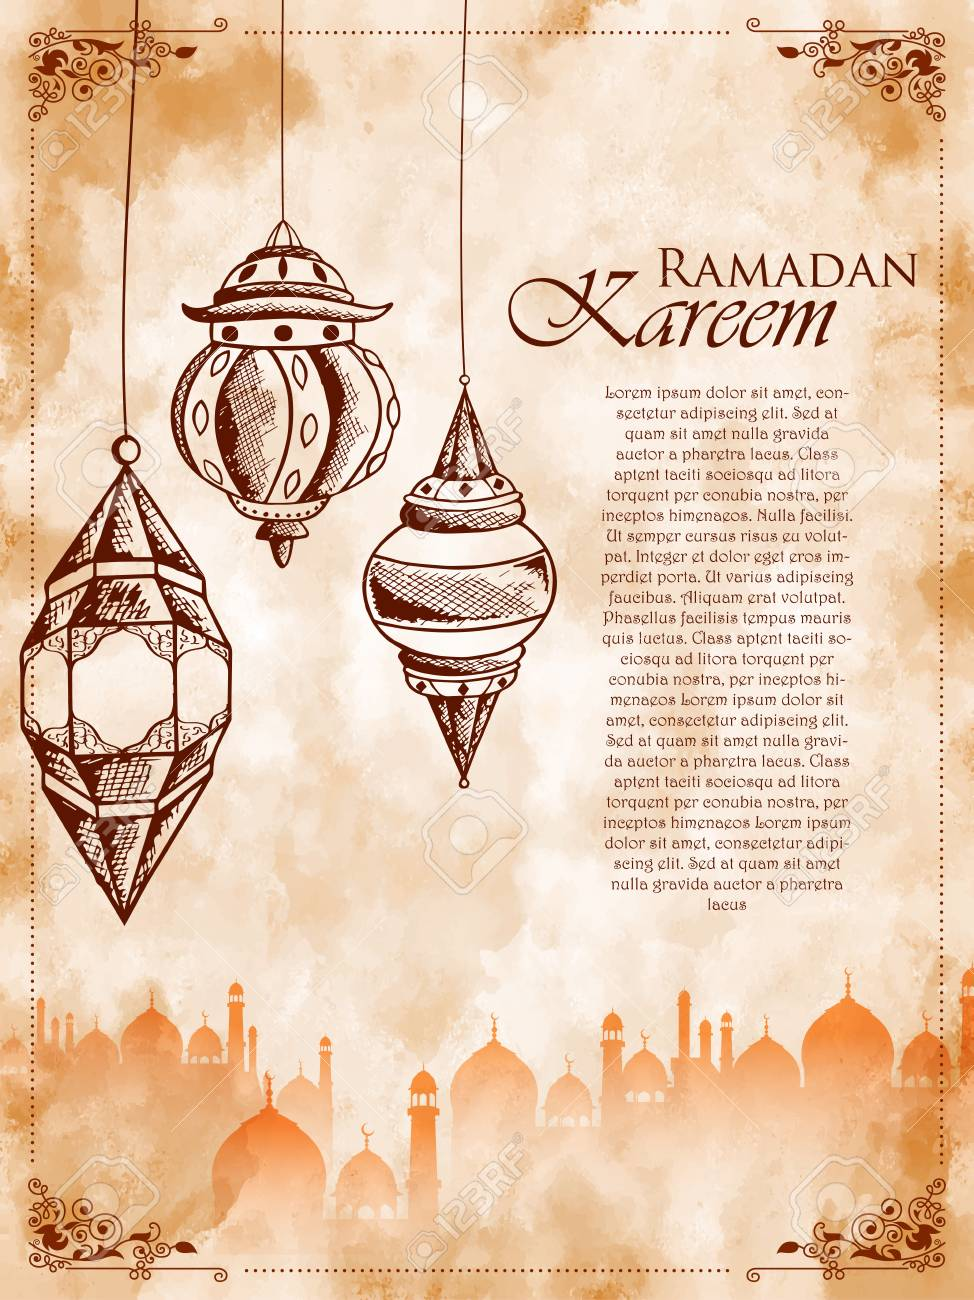 Ramadan kareem generous ramadan greetings for islam religious ramadan kareem generous ramadan greetings for islam religious festival eid on holy month of ramazan stock kristyandbryce Images